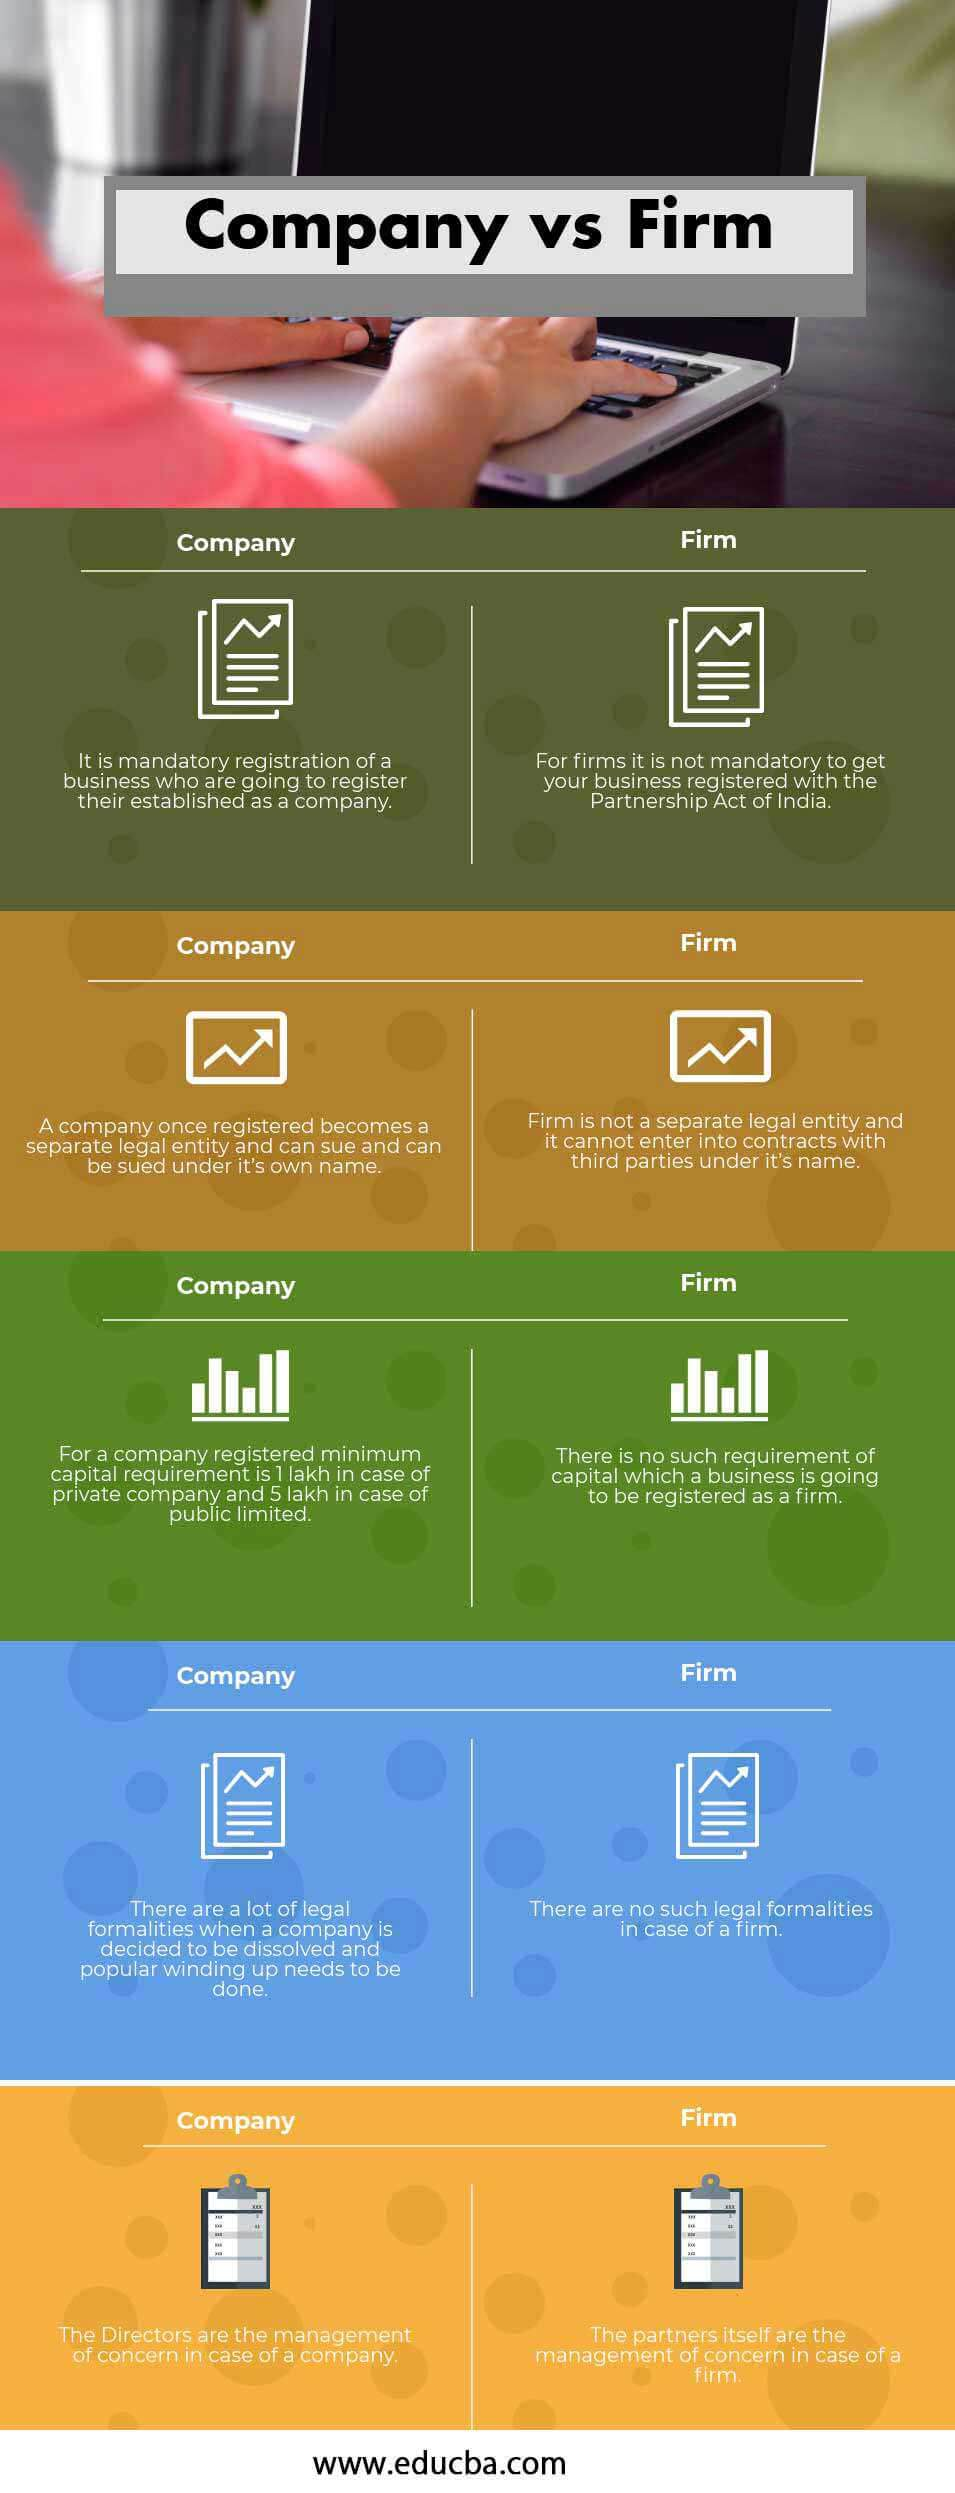 Company vs Firm info